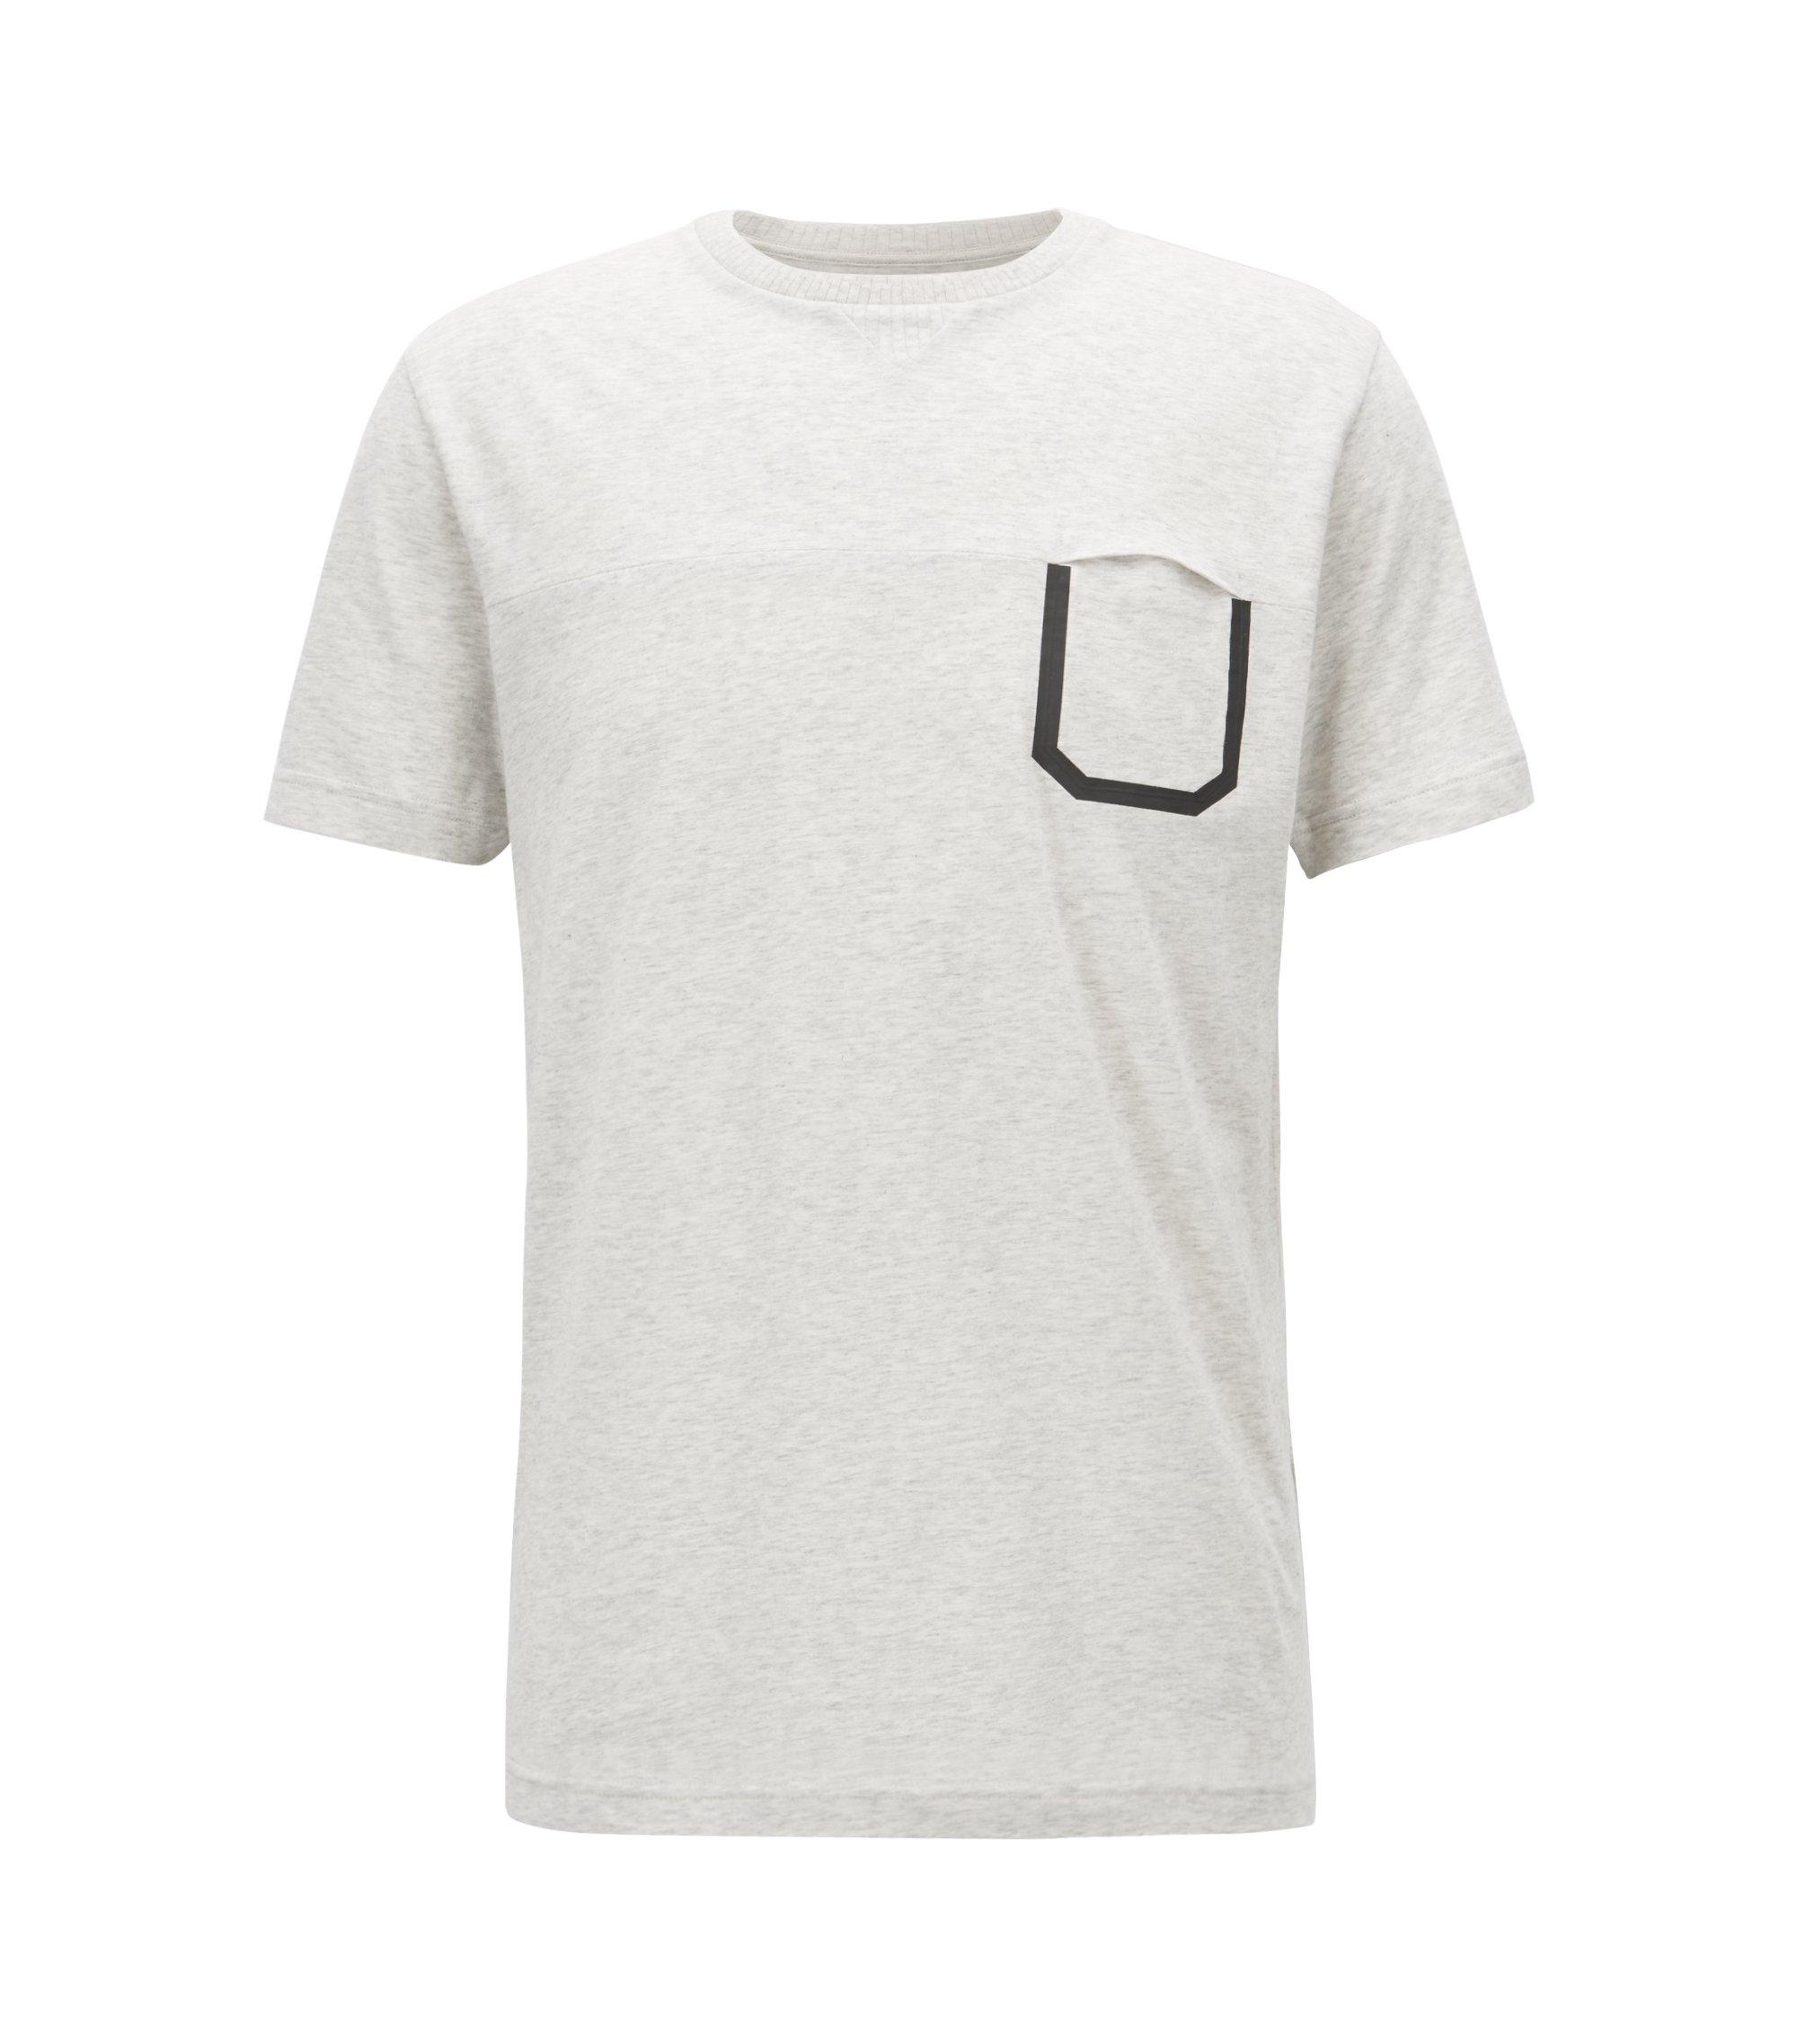 Melange cotton T-shirt with pocket detail, White